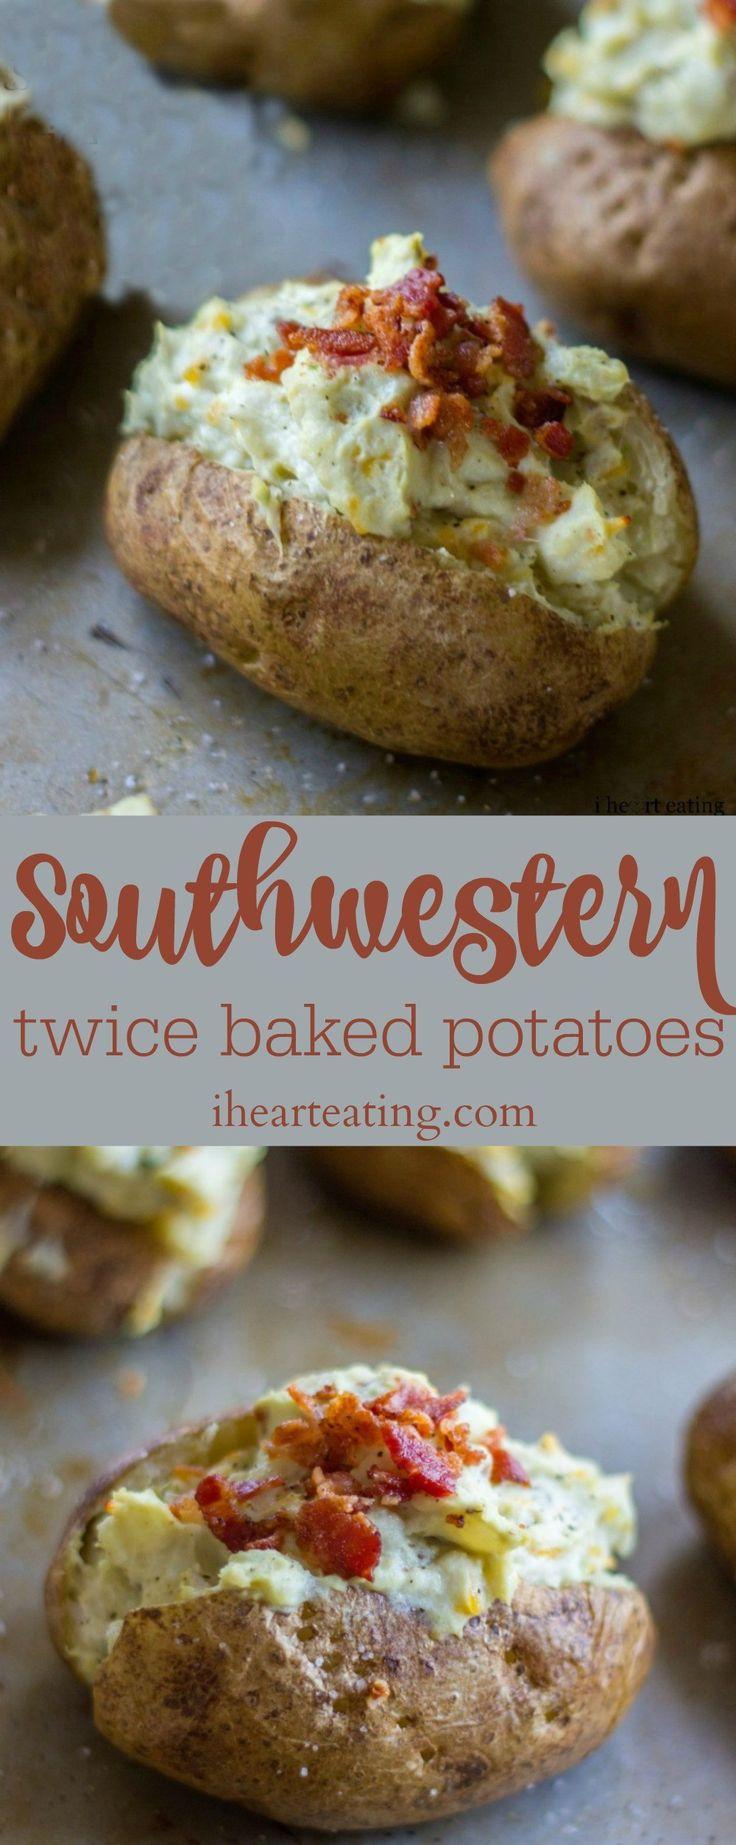 Southwestern Twice Baked Potatoes